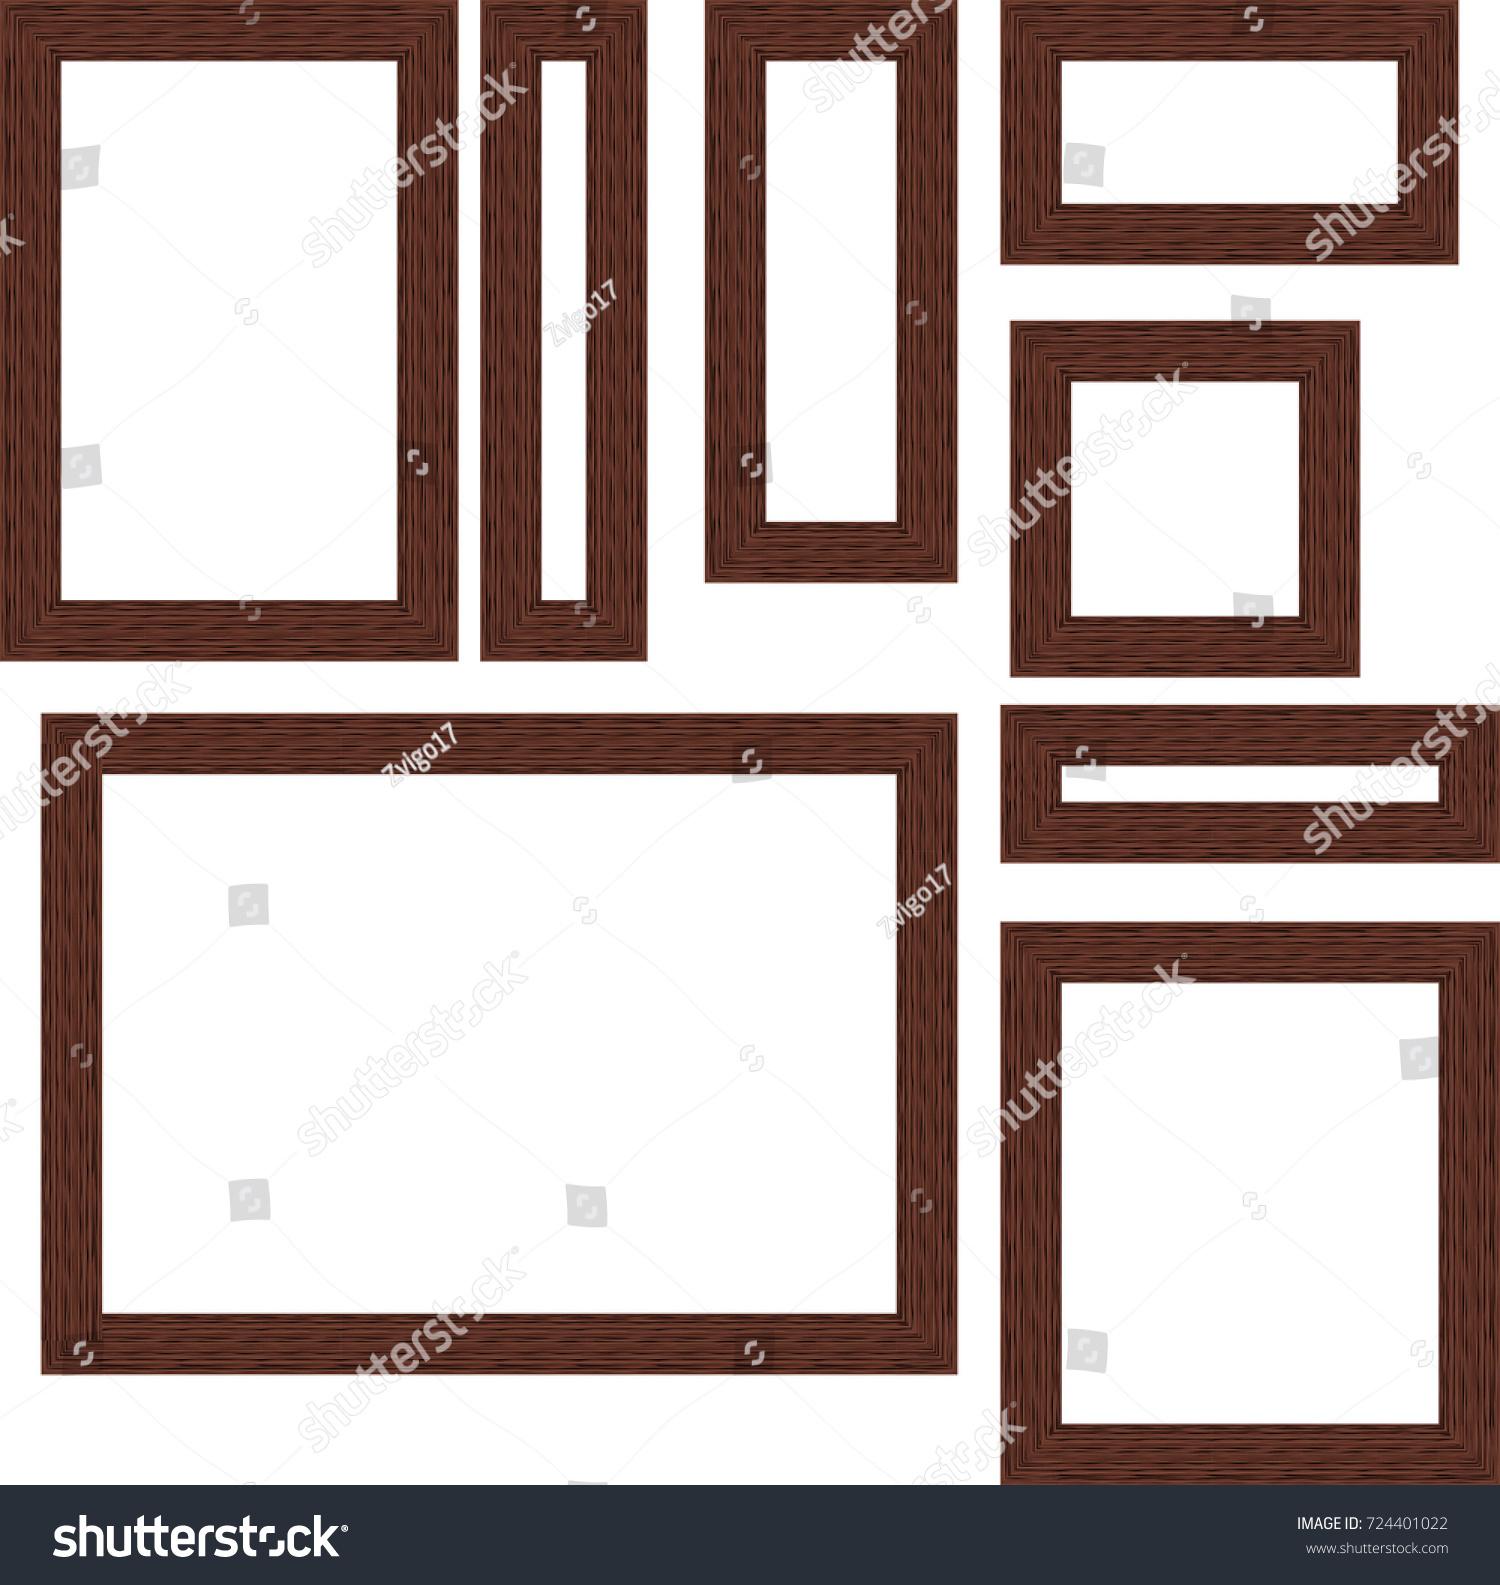 Square Set Frames Transparent Background Vector Stock Vector ...